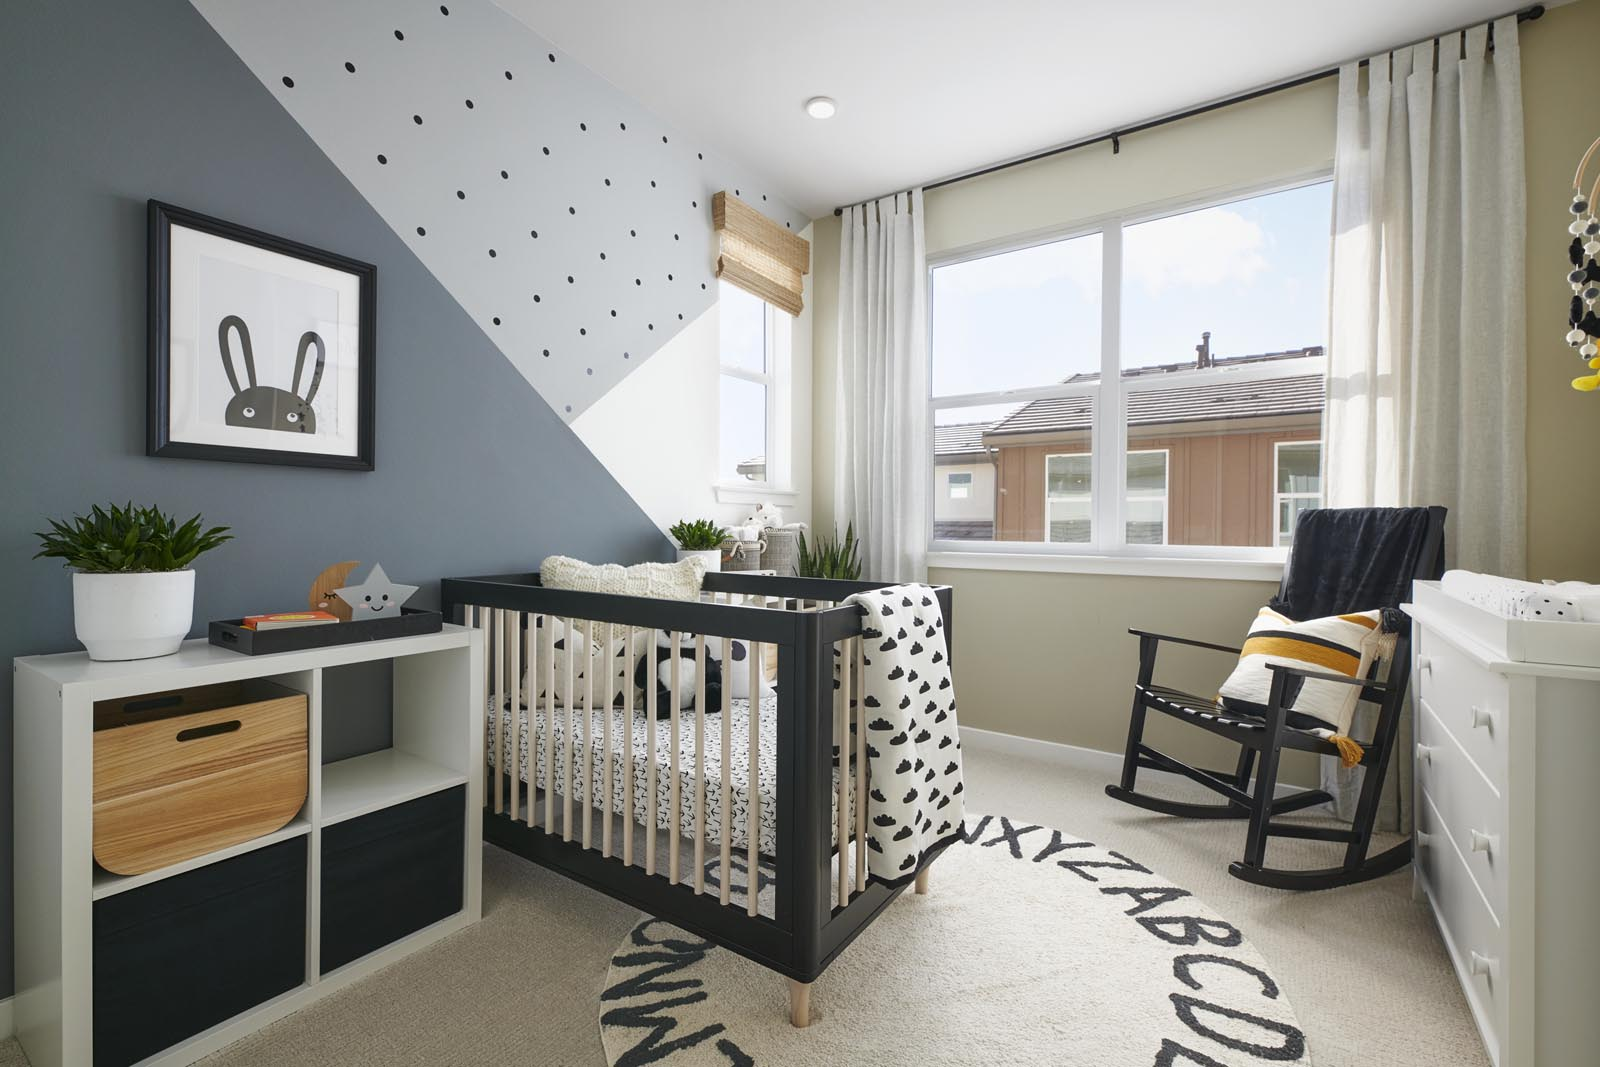 Bedroom | Residence 2 | Enliven | New Homes in Rancho Cucamonga, CA | Van Daele Homes